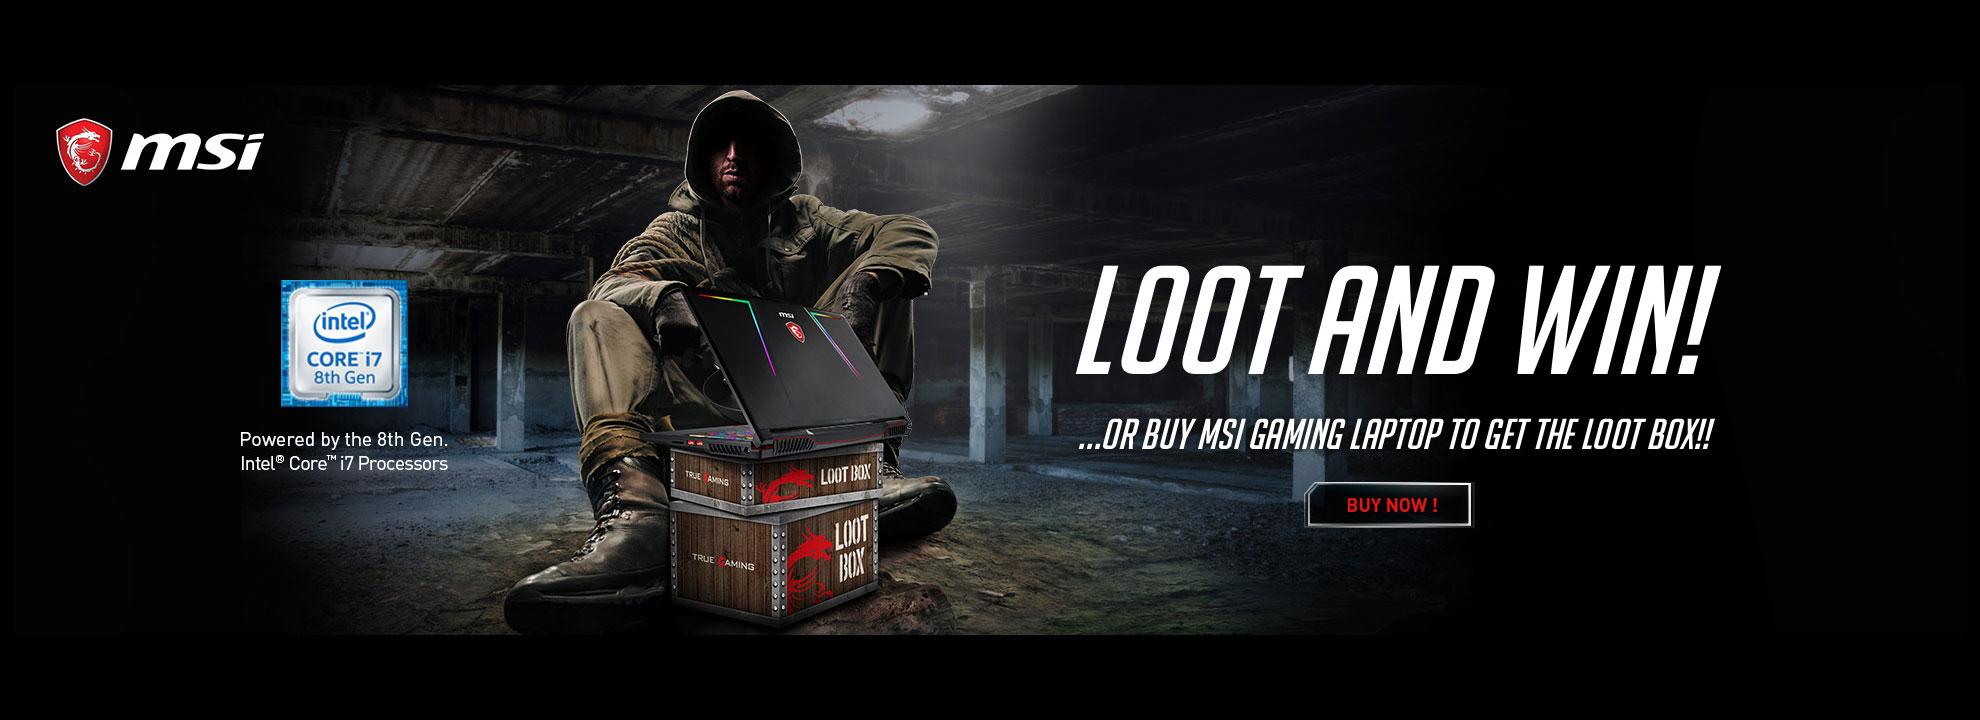 msi-lootbox-1920x550.jpg